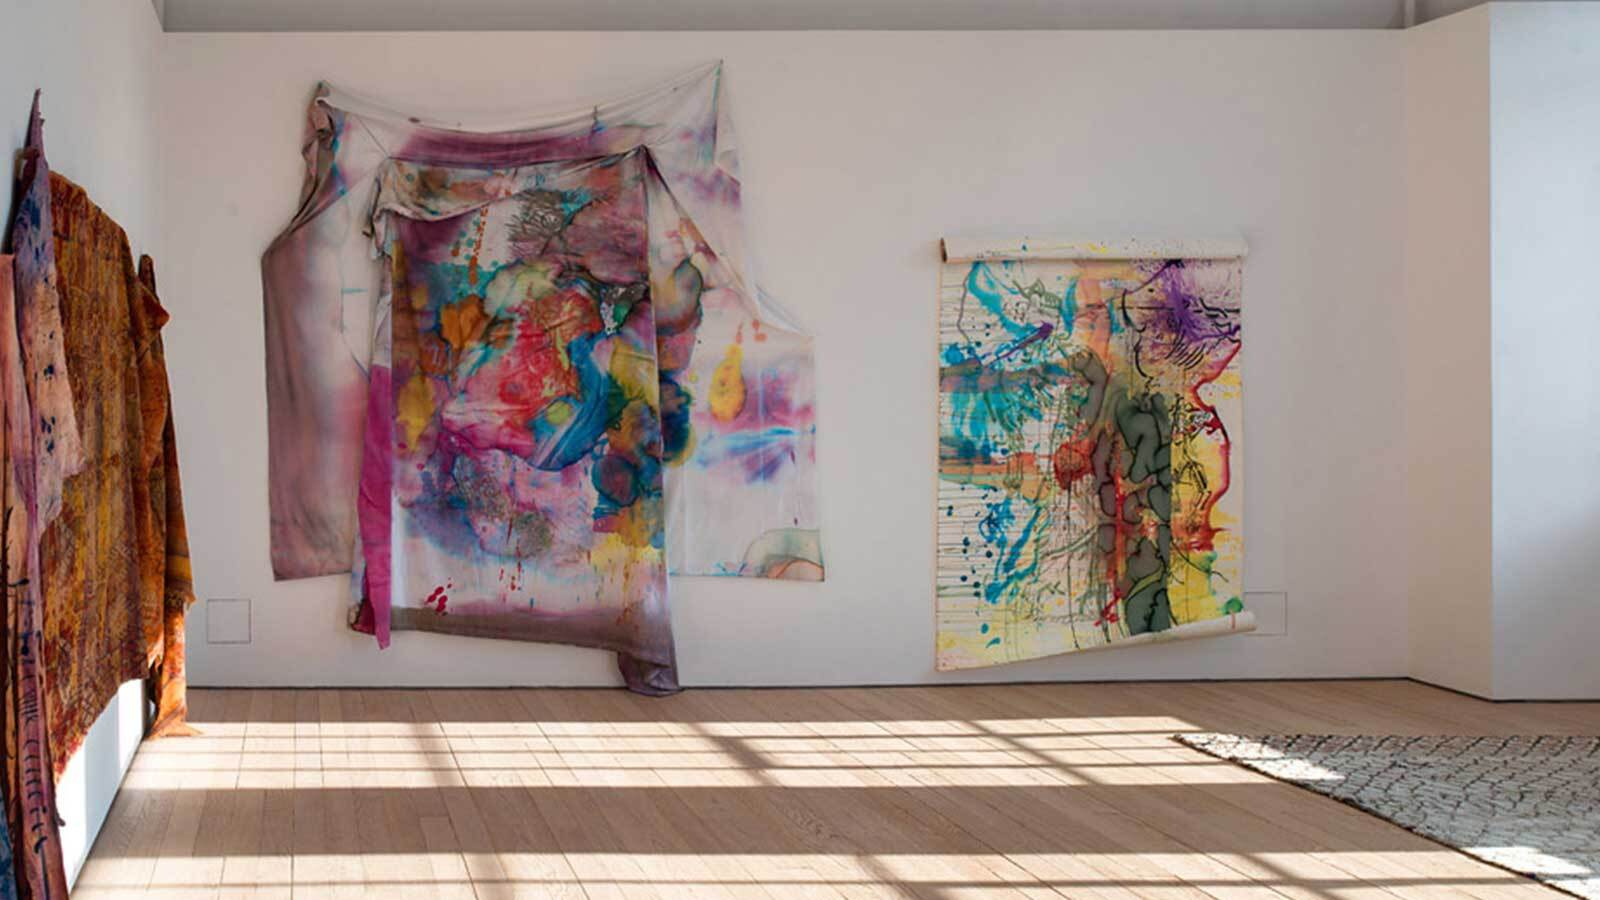 Photograph of Jacqui Hallum's berber carpet installation at Exeter Phoenix